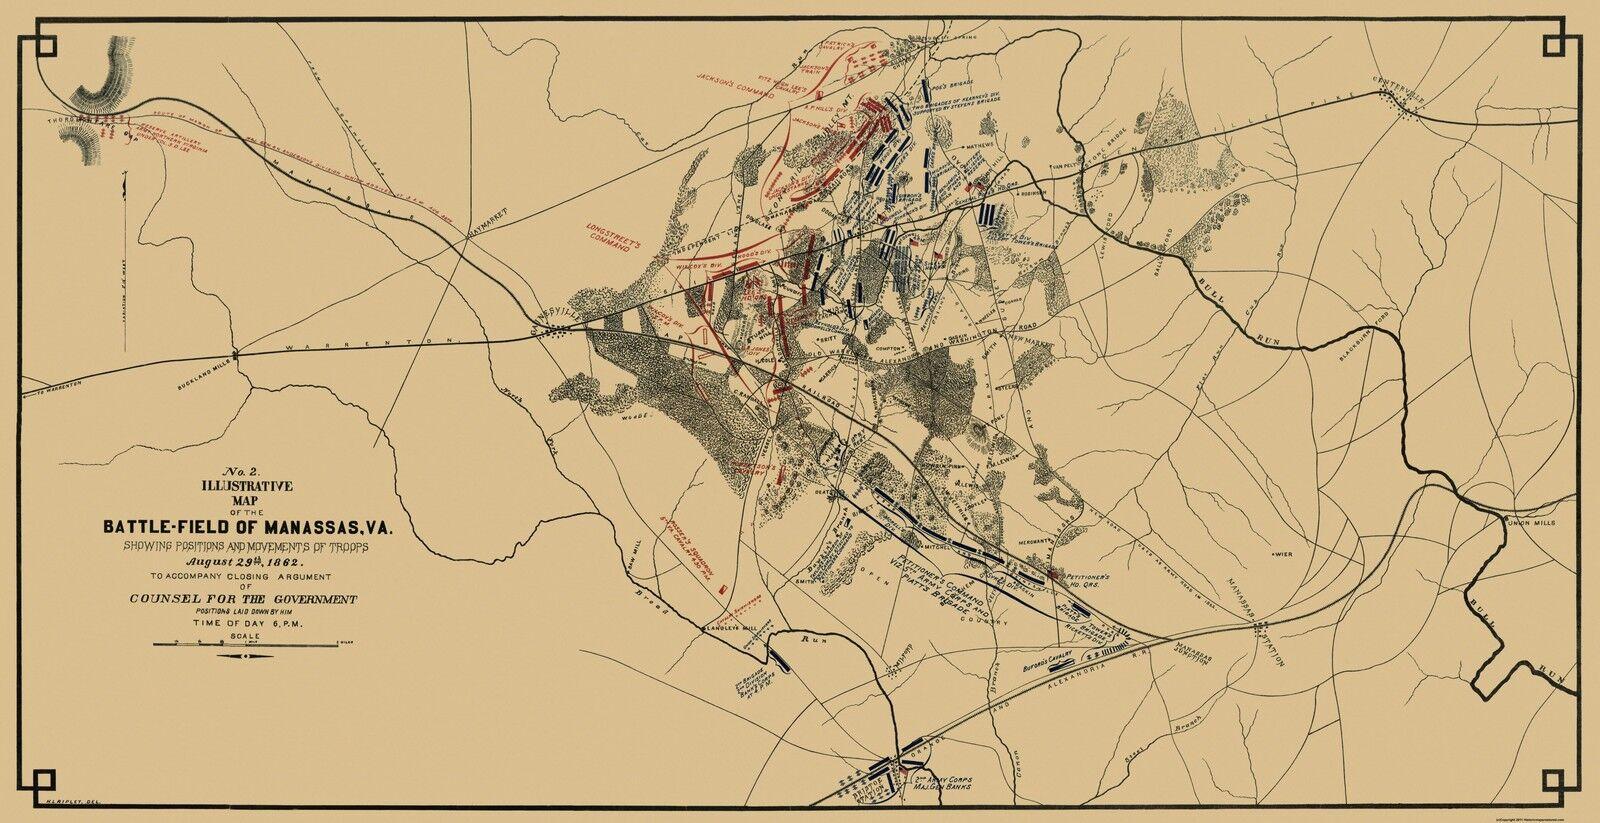 Civil War Map Print - Manassas Battlefield Virginia - 1862 - 44.69 x 23